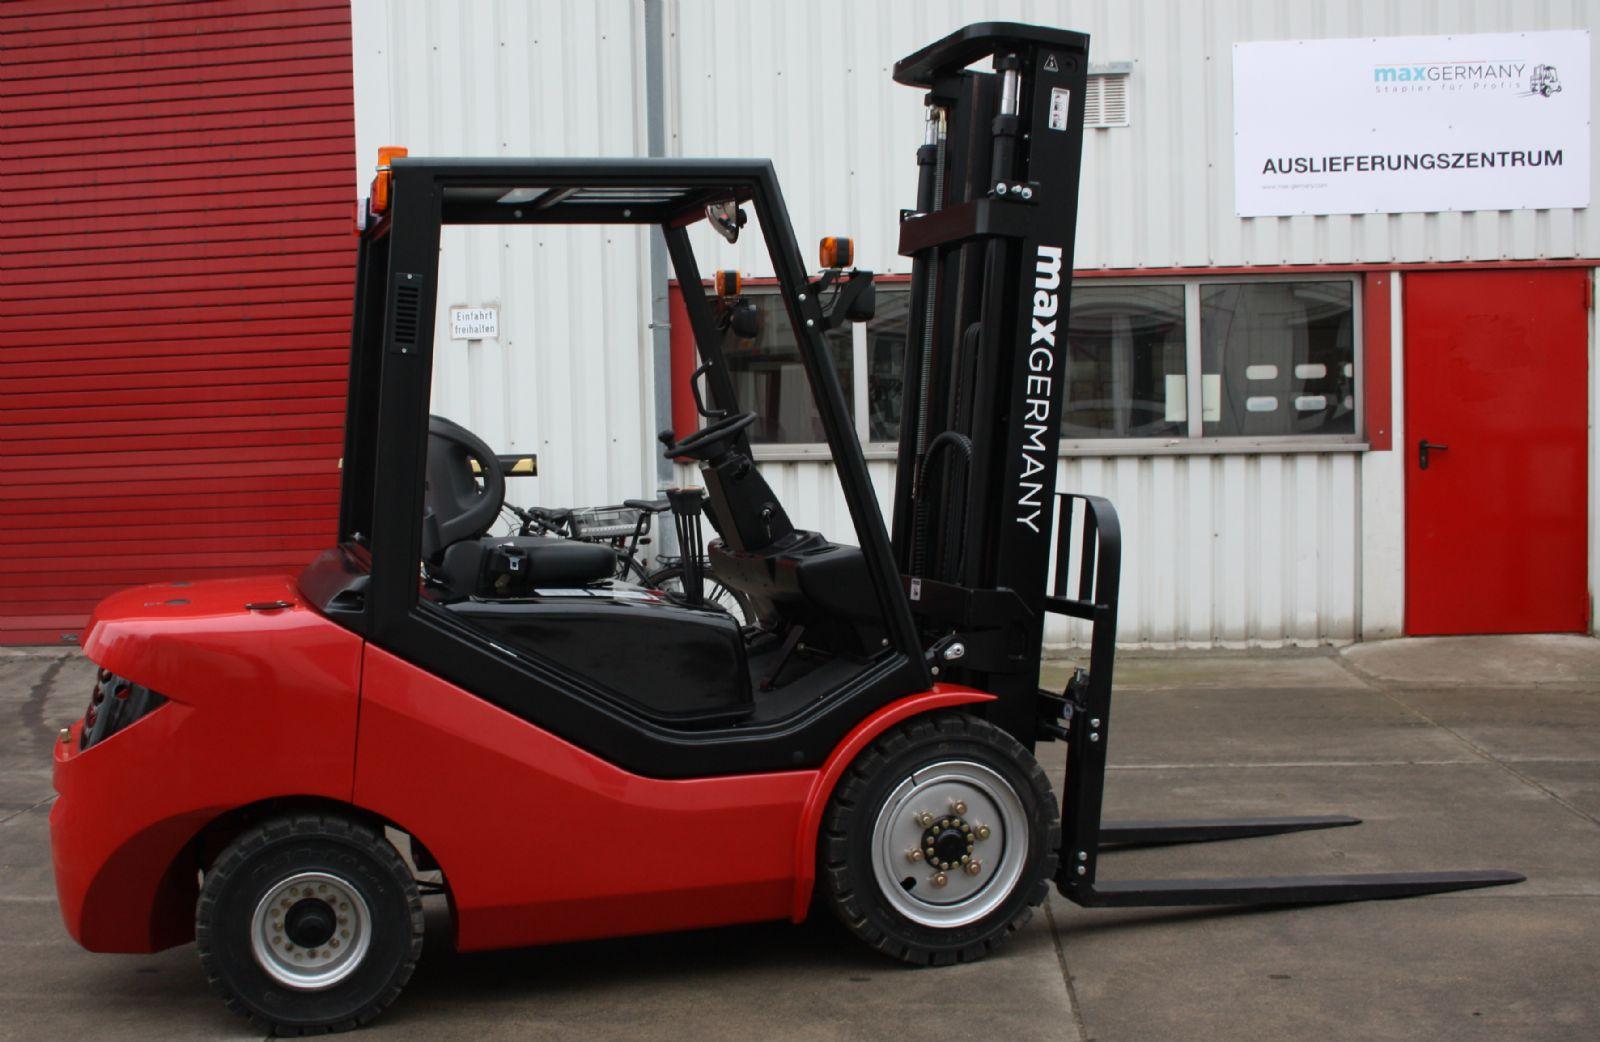 Max Germany Dieselstapler 4t